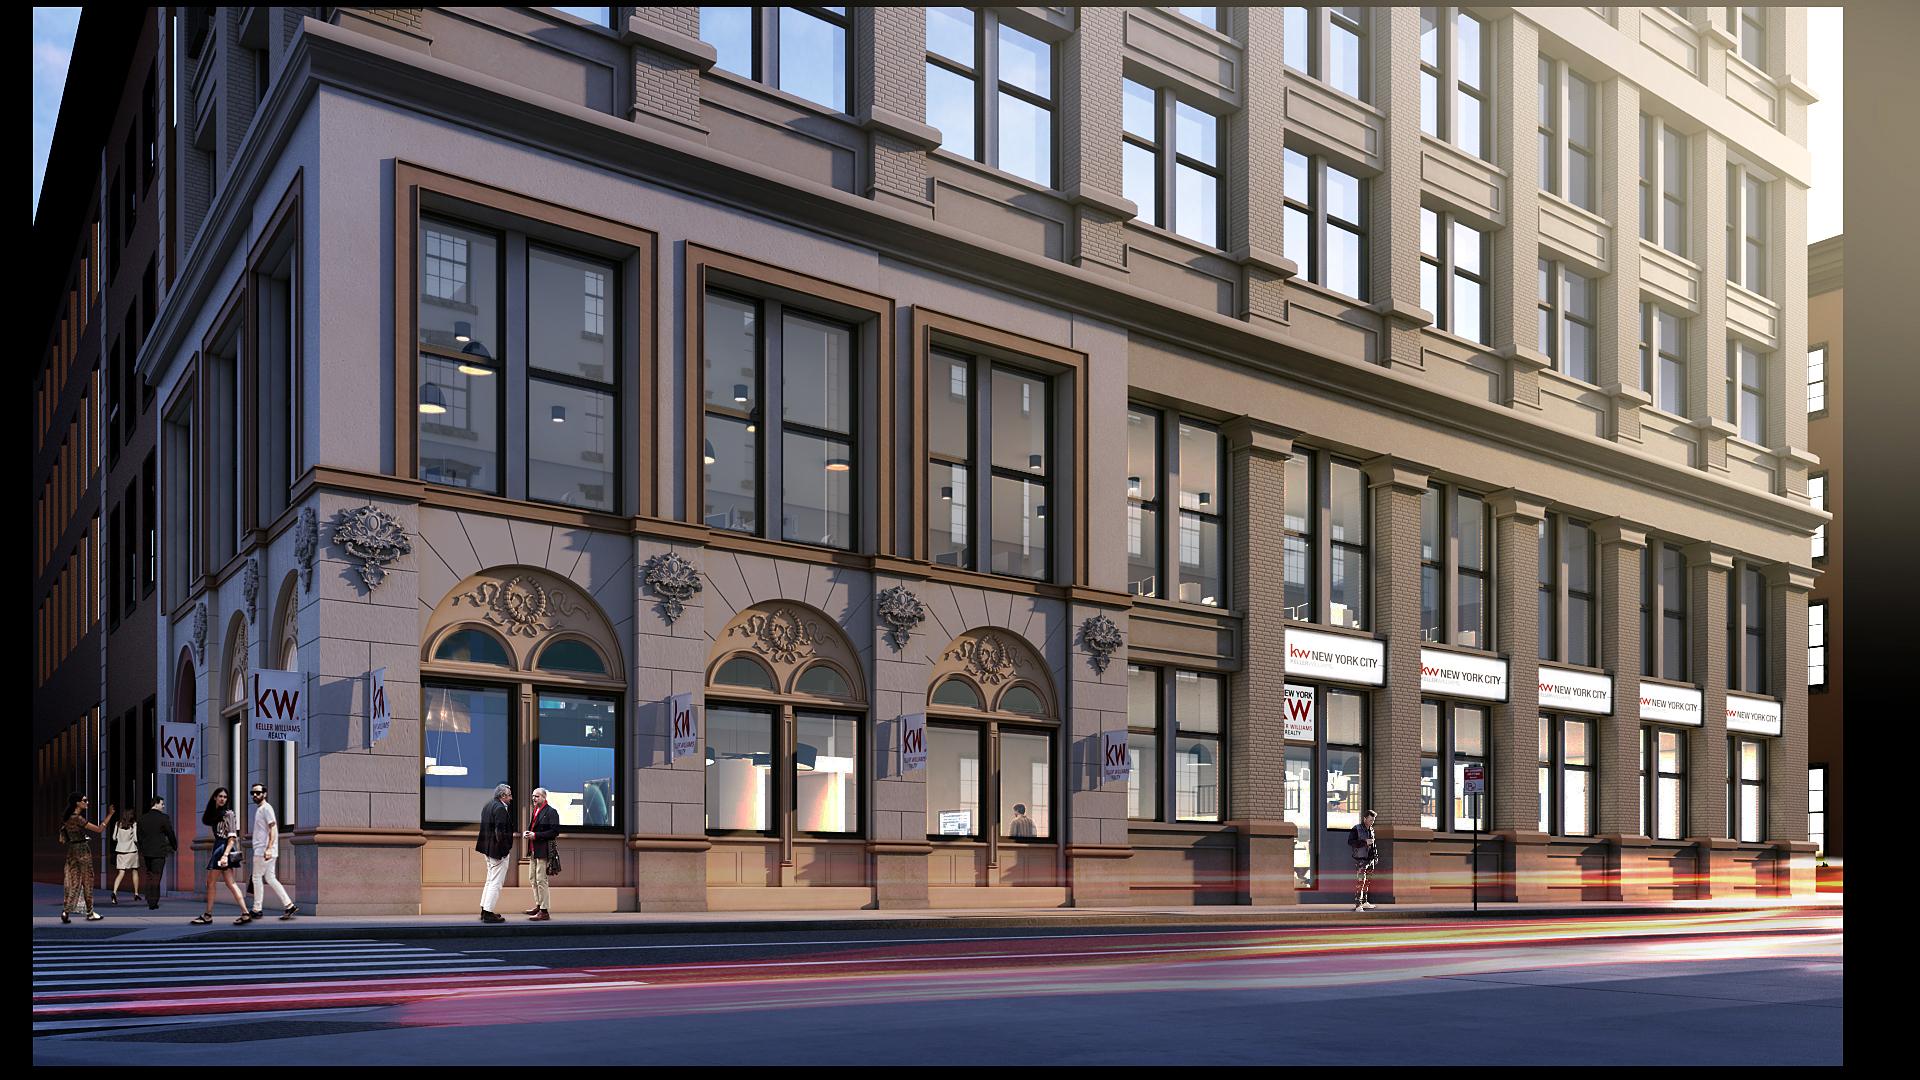 377 Broadway, New York, NY (*Artist rendering)